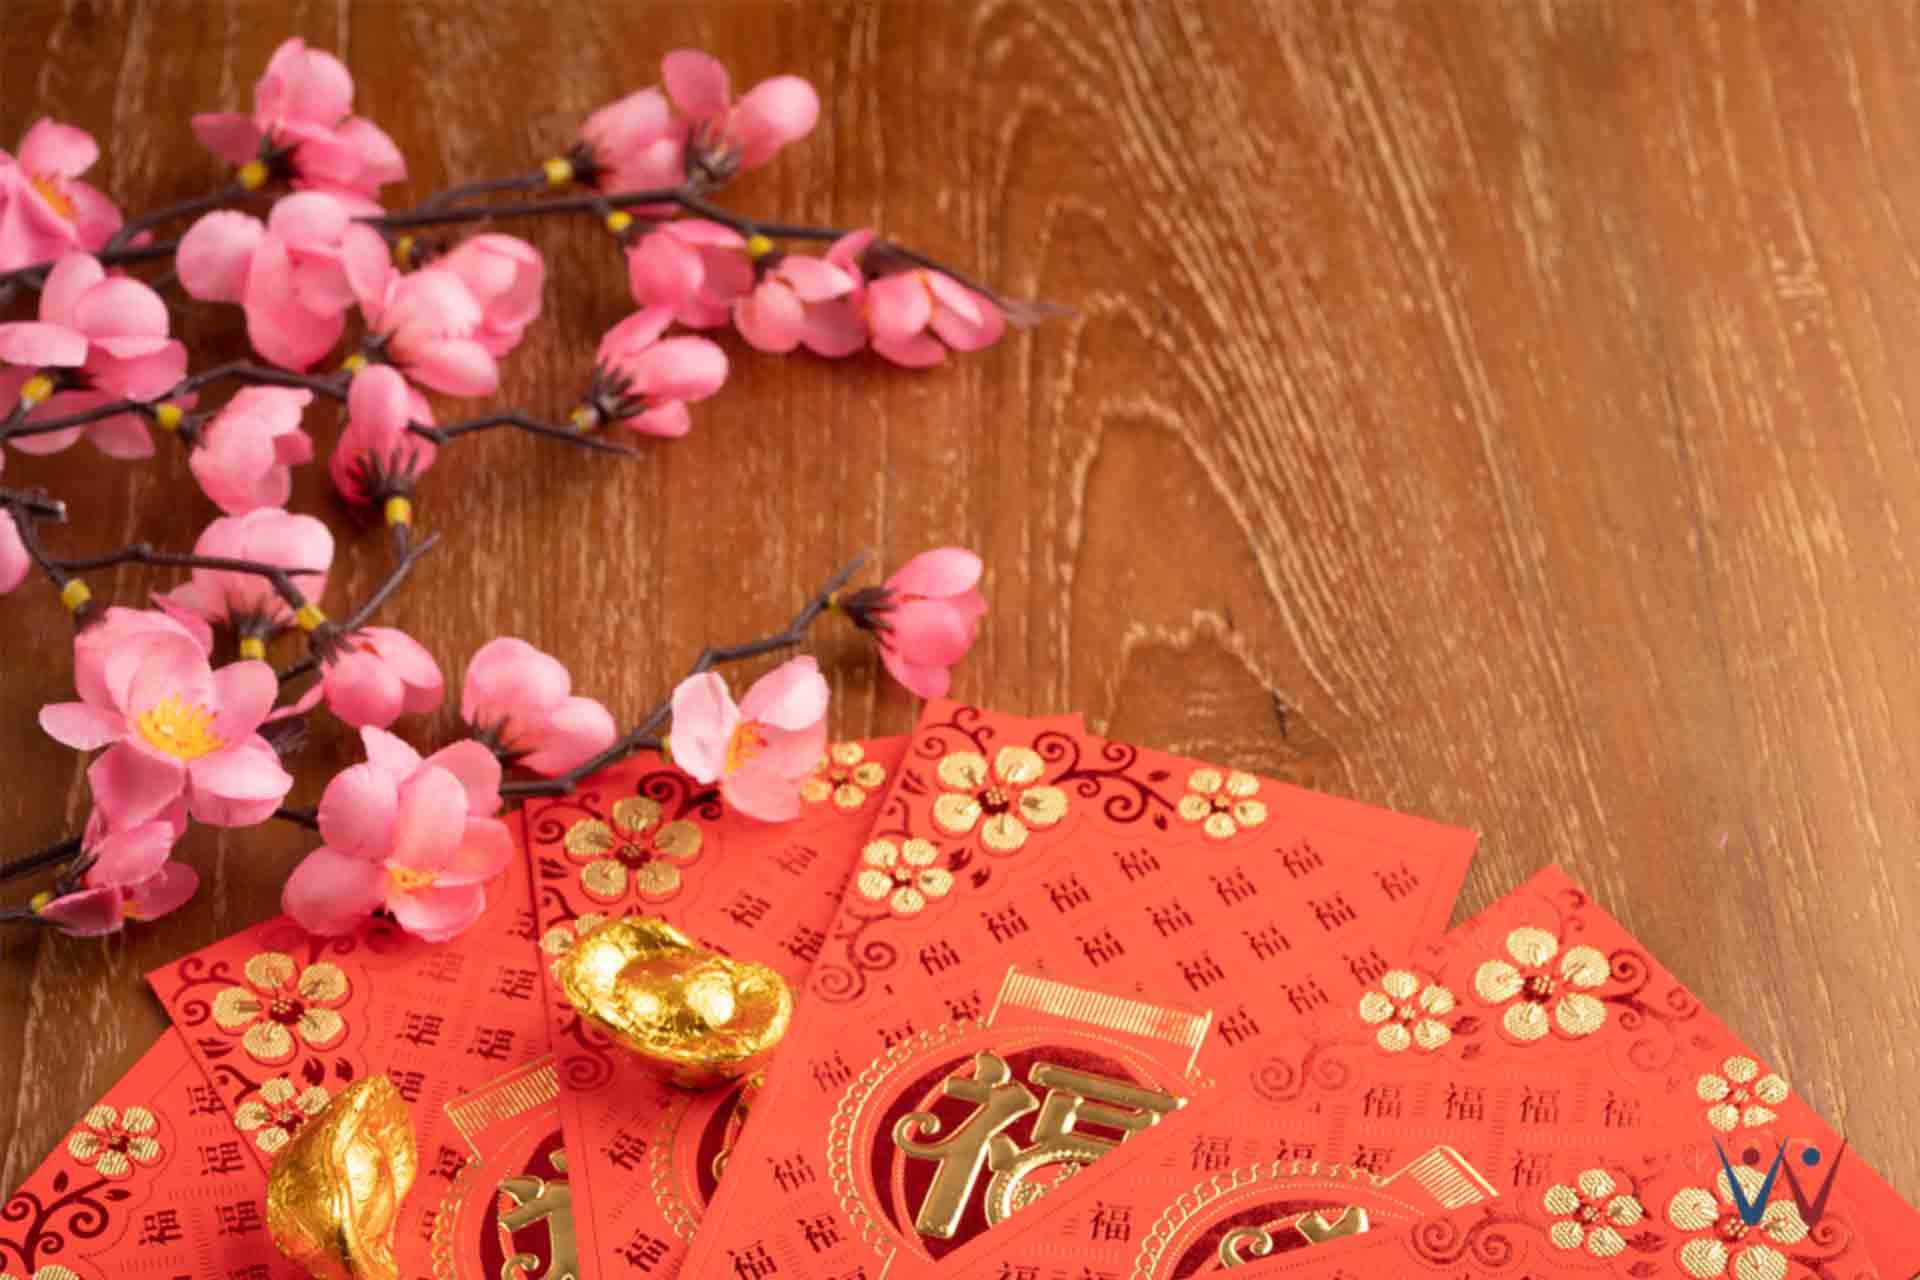 Menyambut Tahun Baru Imlek, Simak 4 Tips Berikut Agar Keuangan Kamu Tetap Aman - angpao imlek